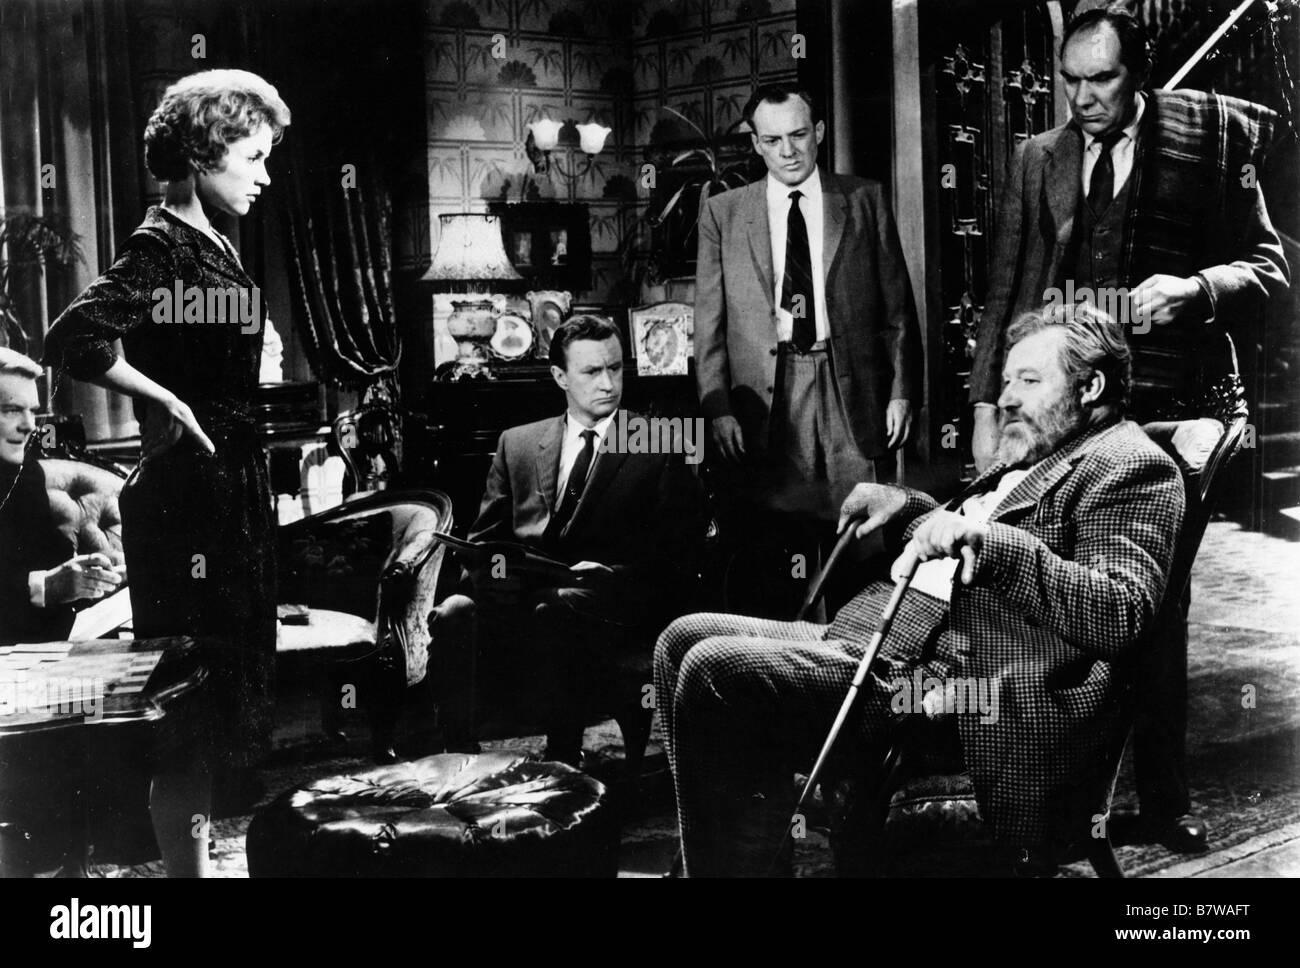 Murder She Said  Year: 1961  Director: George Pollock Muriel Pavlow, Conrad Phillips, Gerald Cross, Thorley Walters, - Stock Image